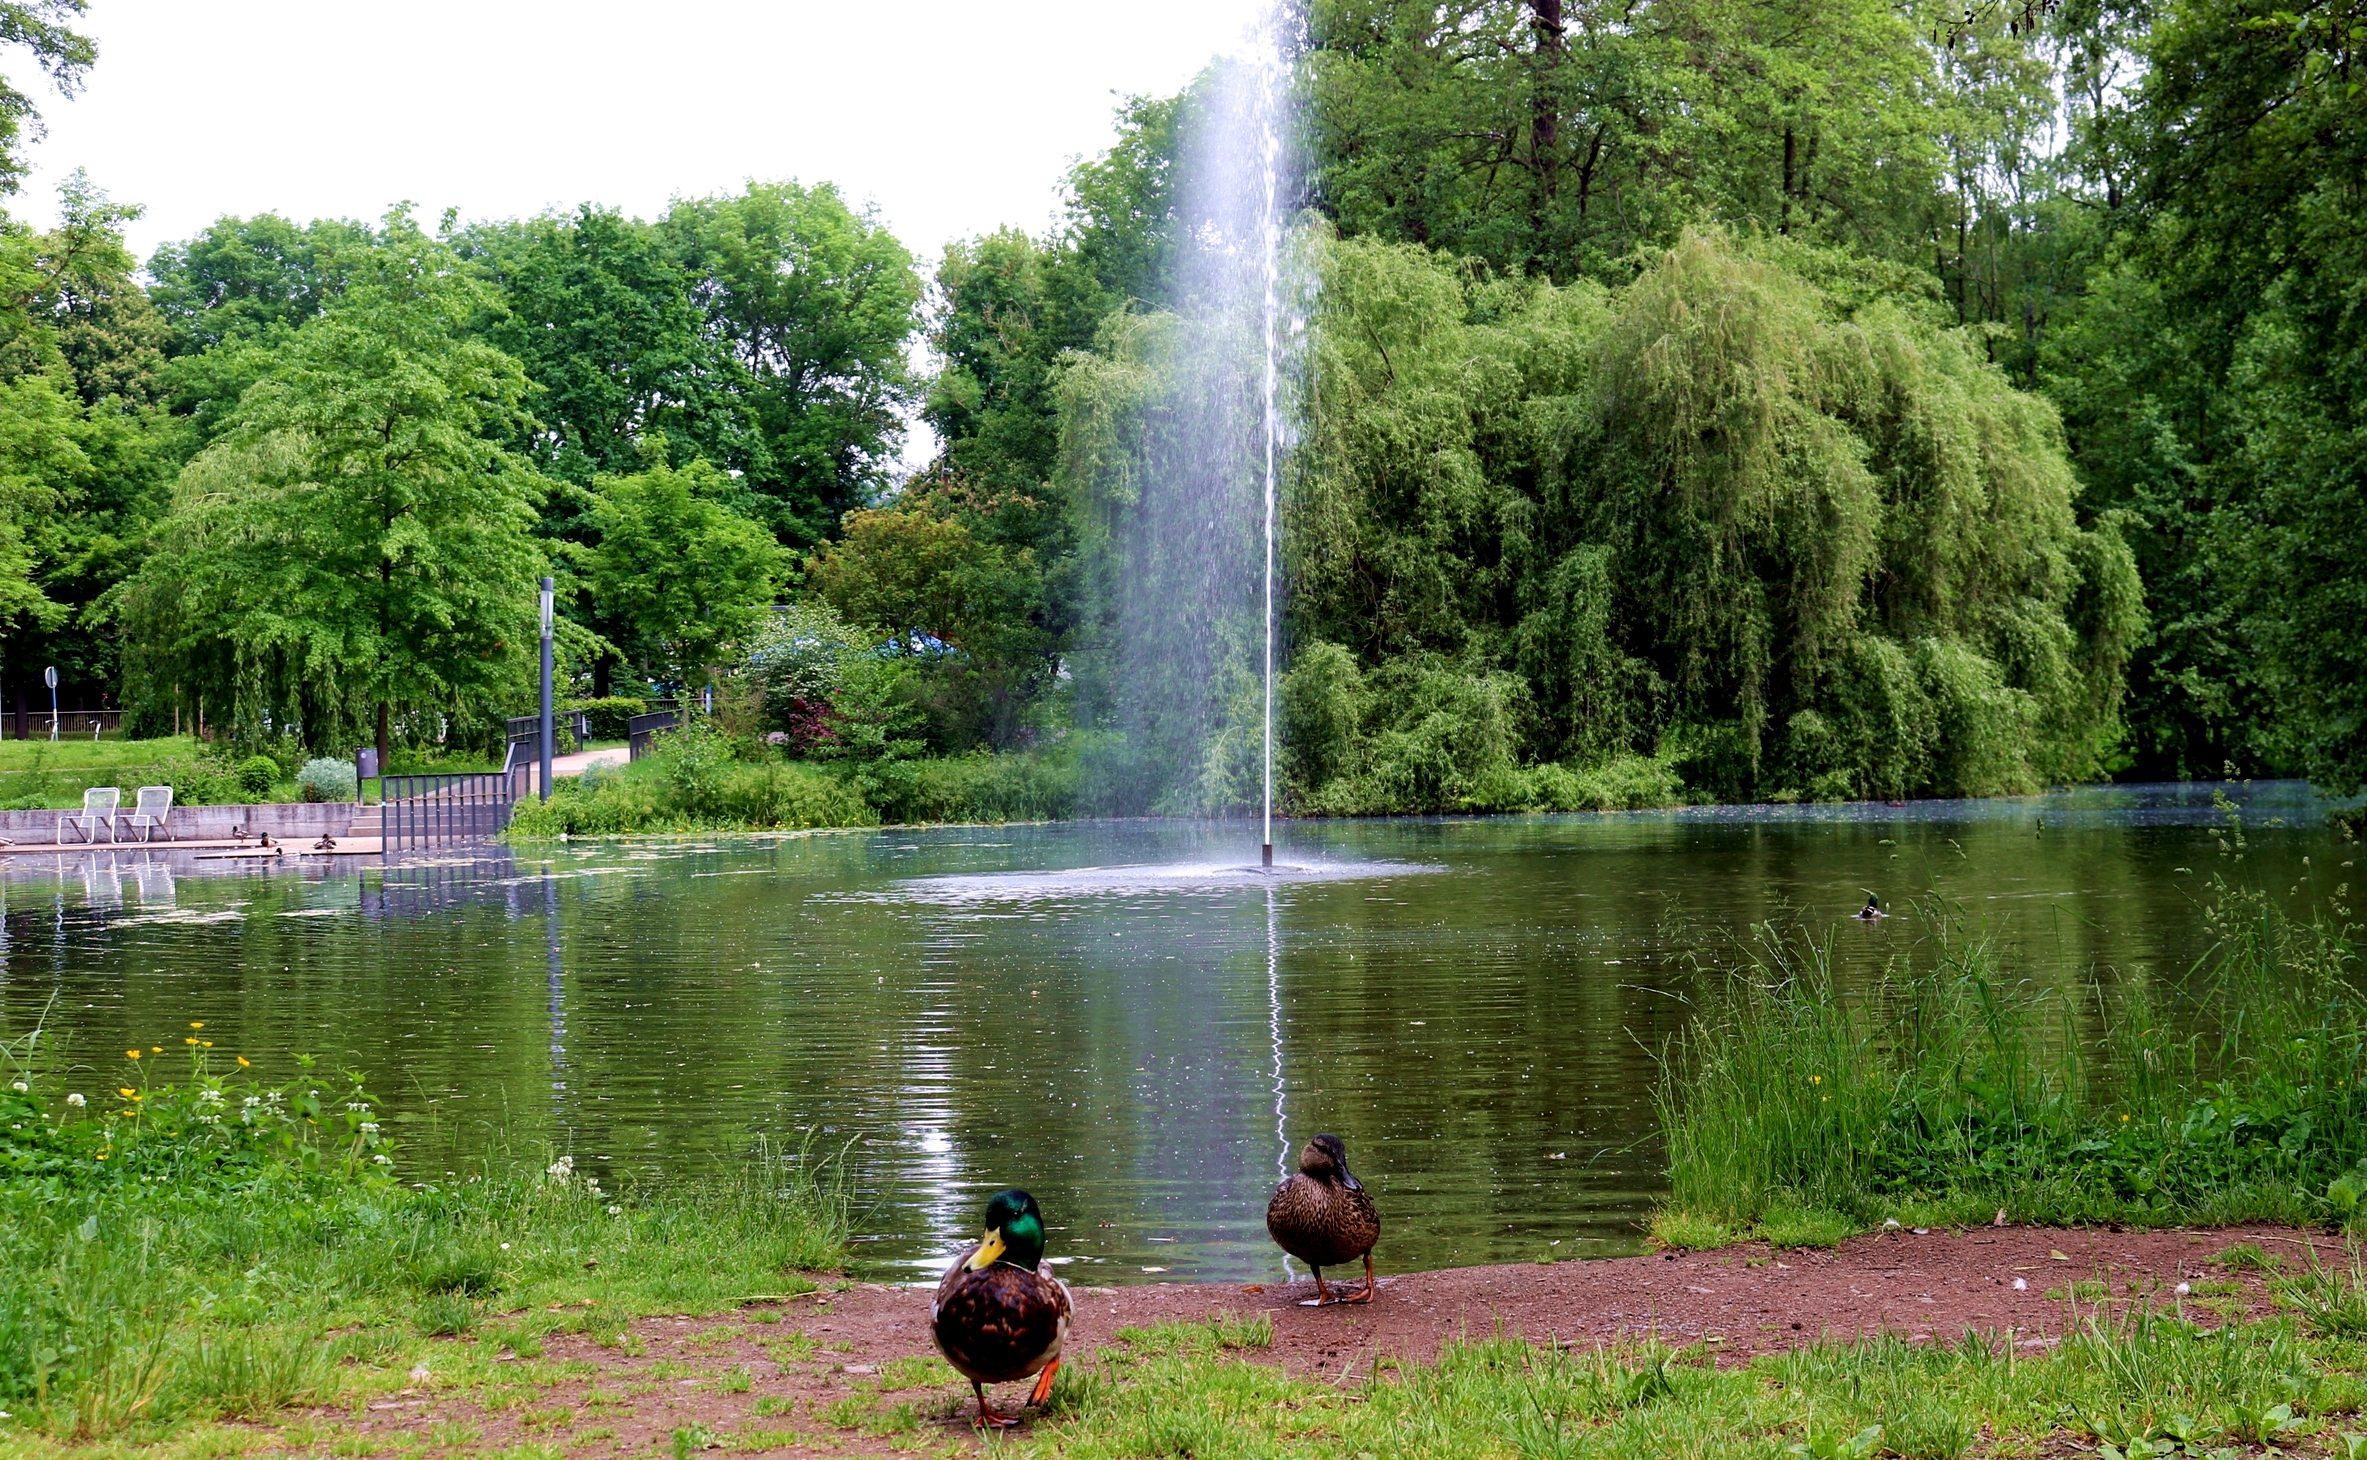 nordhausen-stadtpark-see-enten-Jessica-Piper.jpg